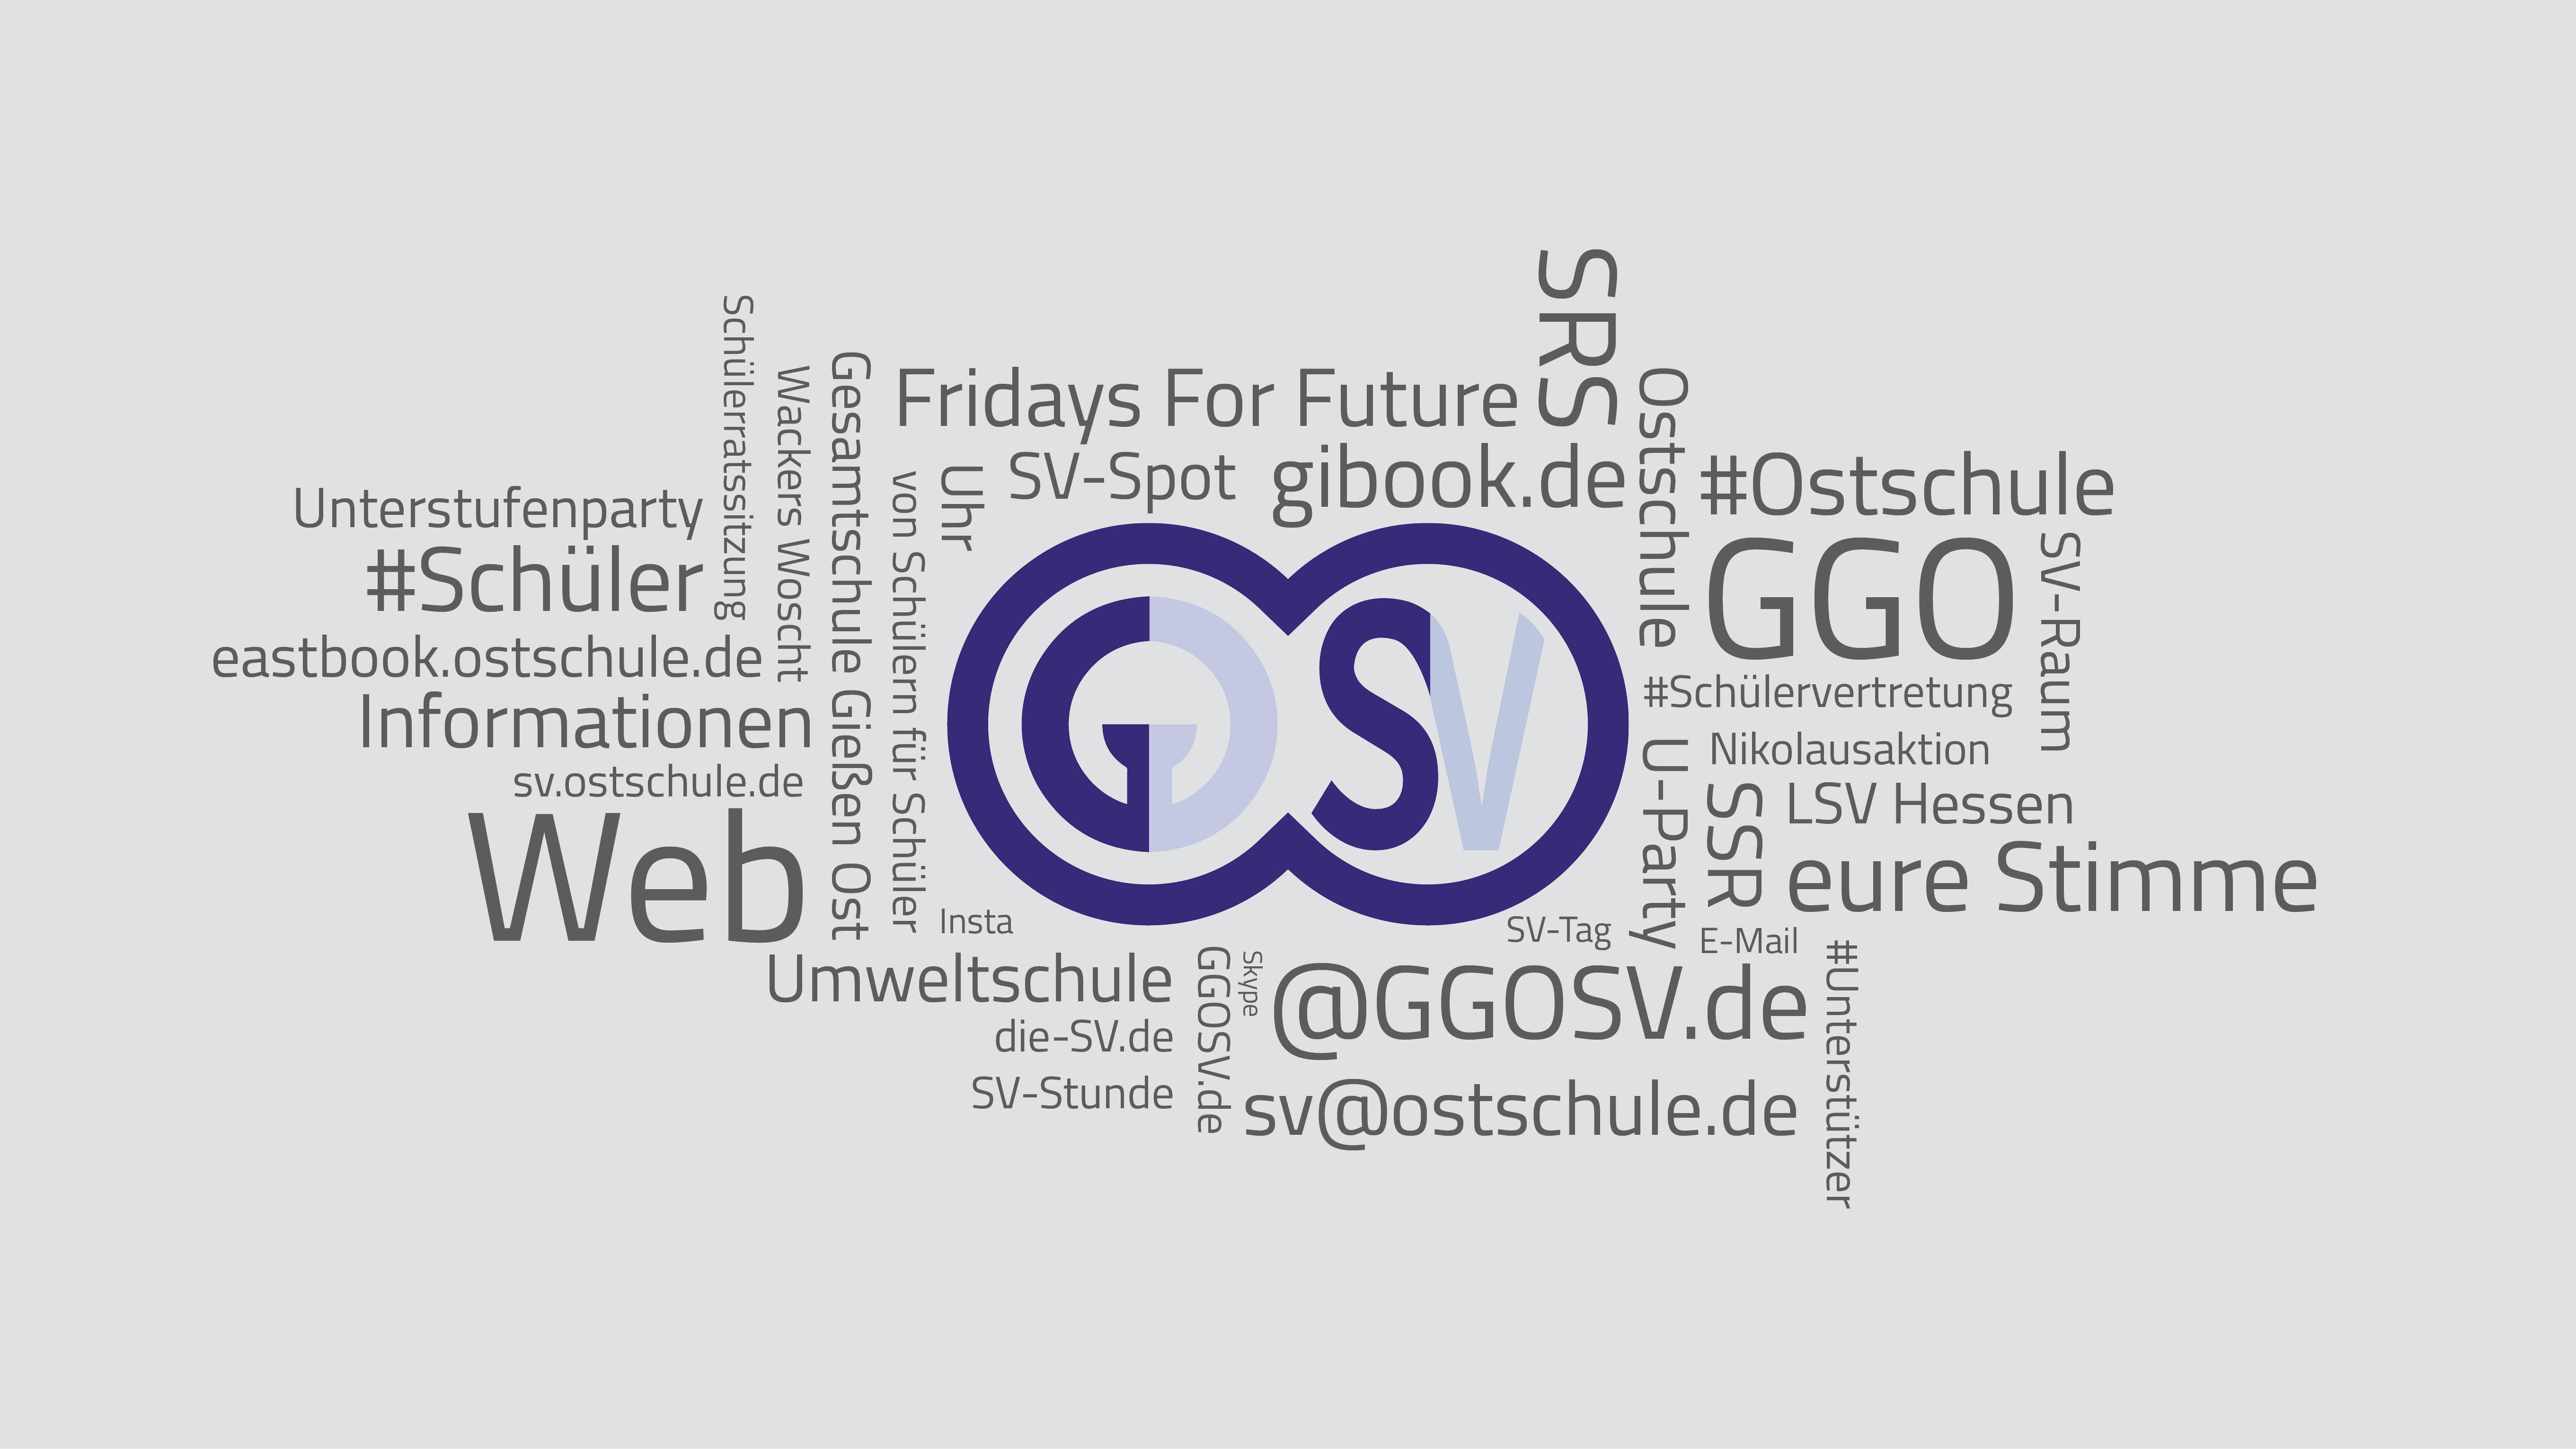 GGOSV